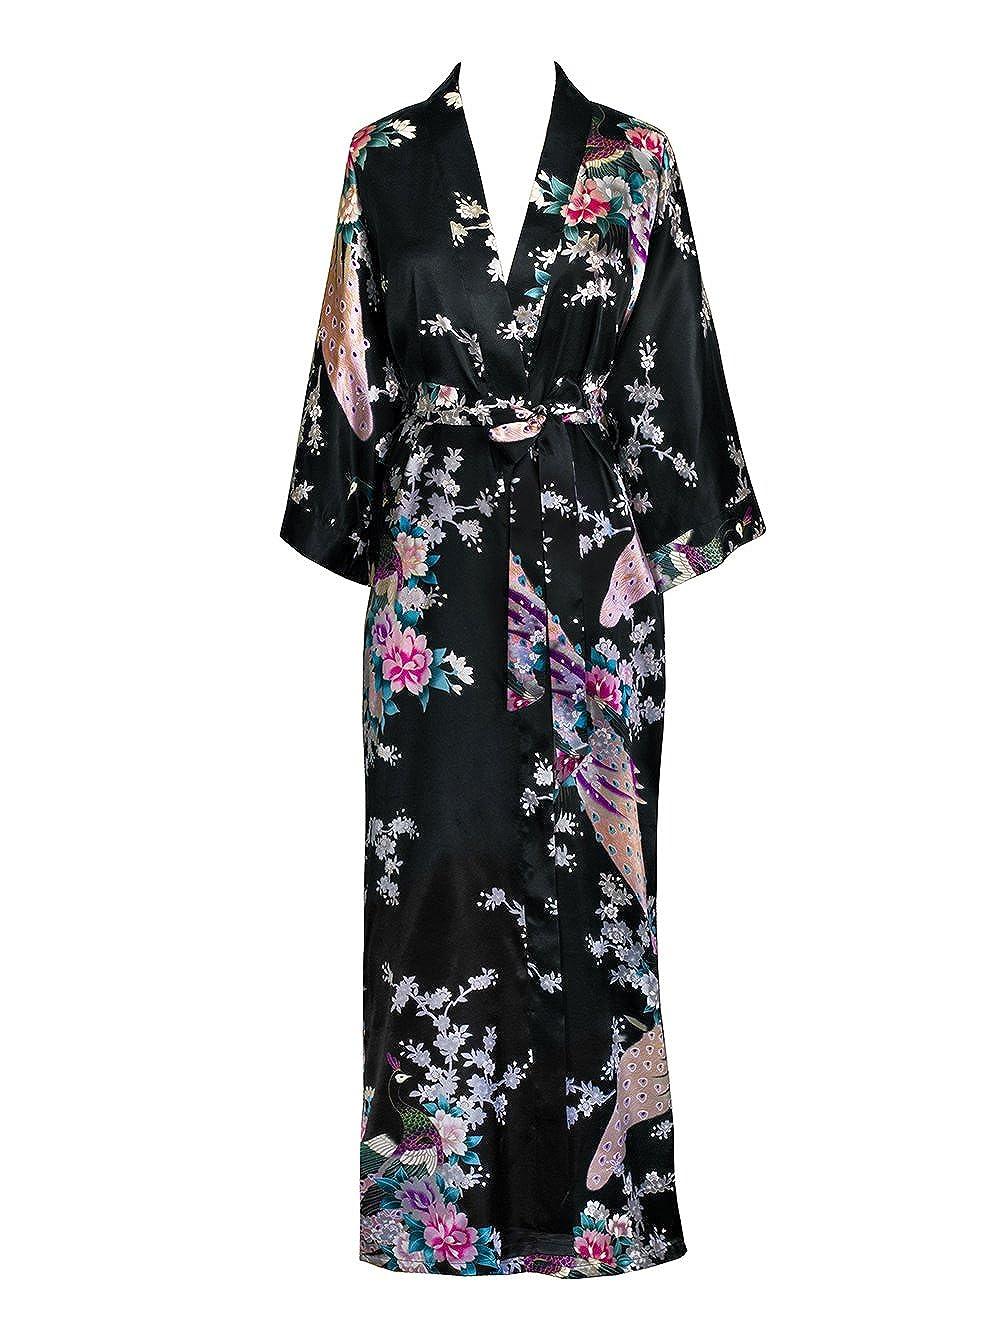 Old shanghai womens kimono long robe peacock blossoms black on seam pocket  at amazon womens clothing 5760aa011